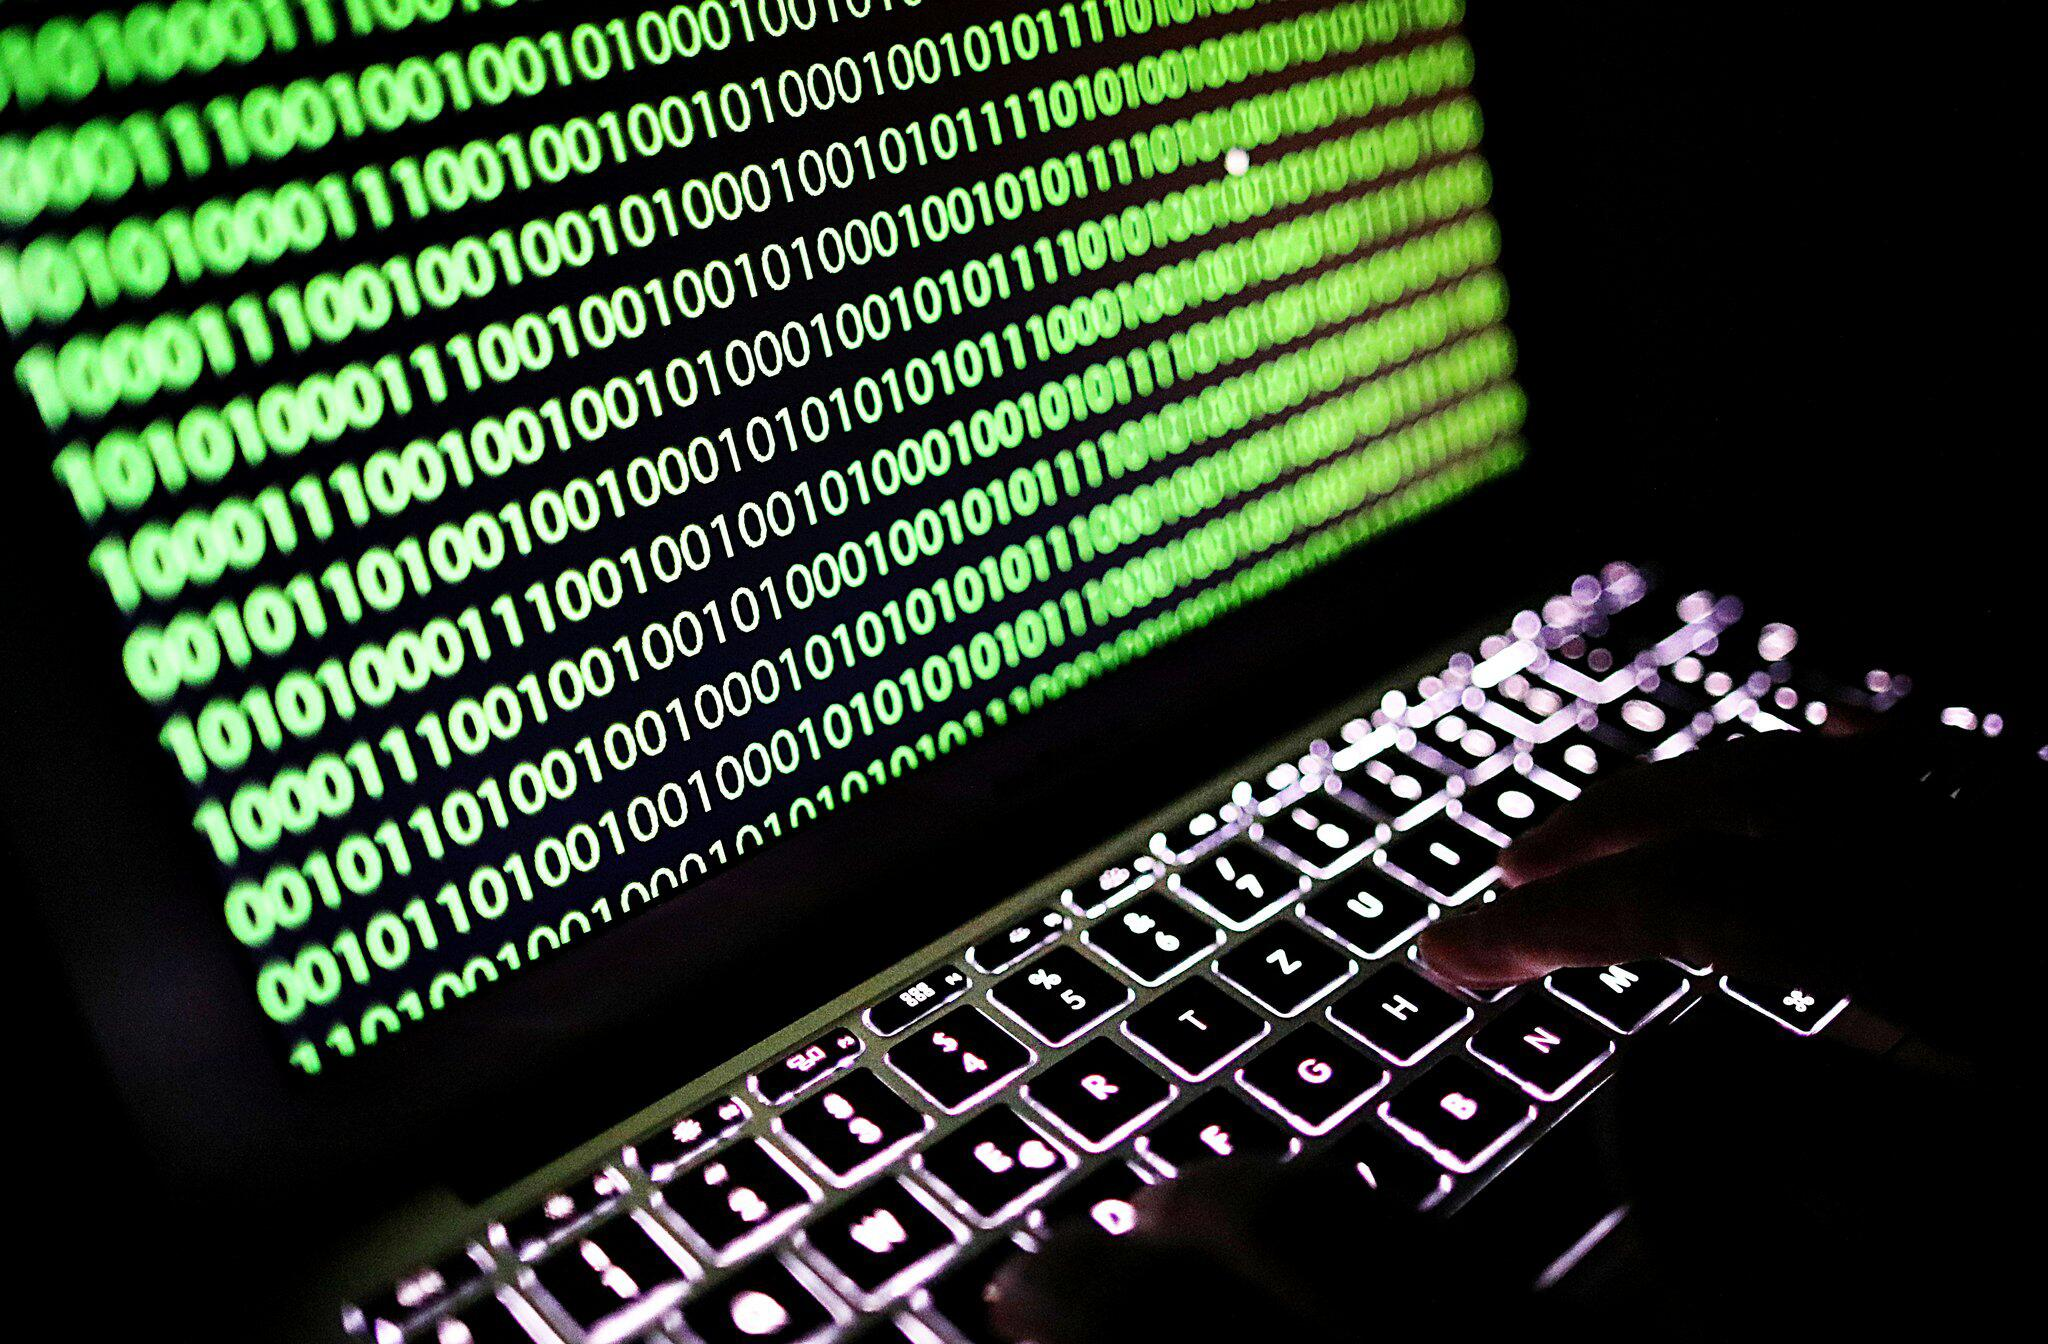 Bild zu Kampf gegen Cyberkriminalität